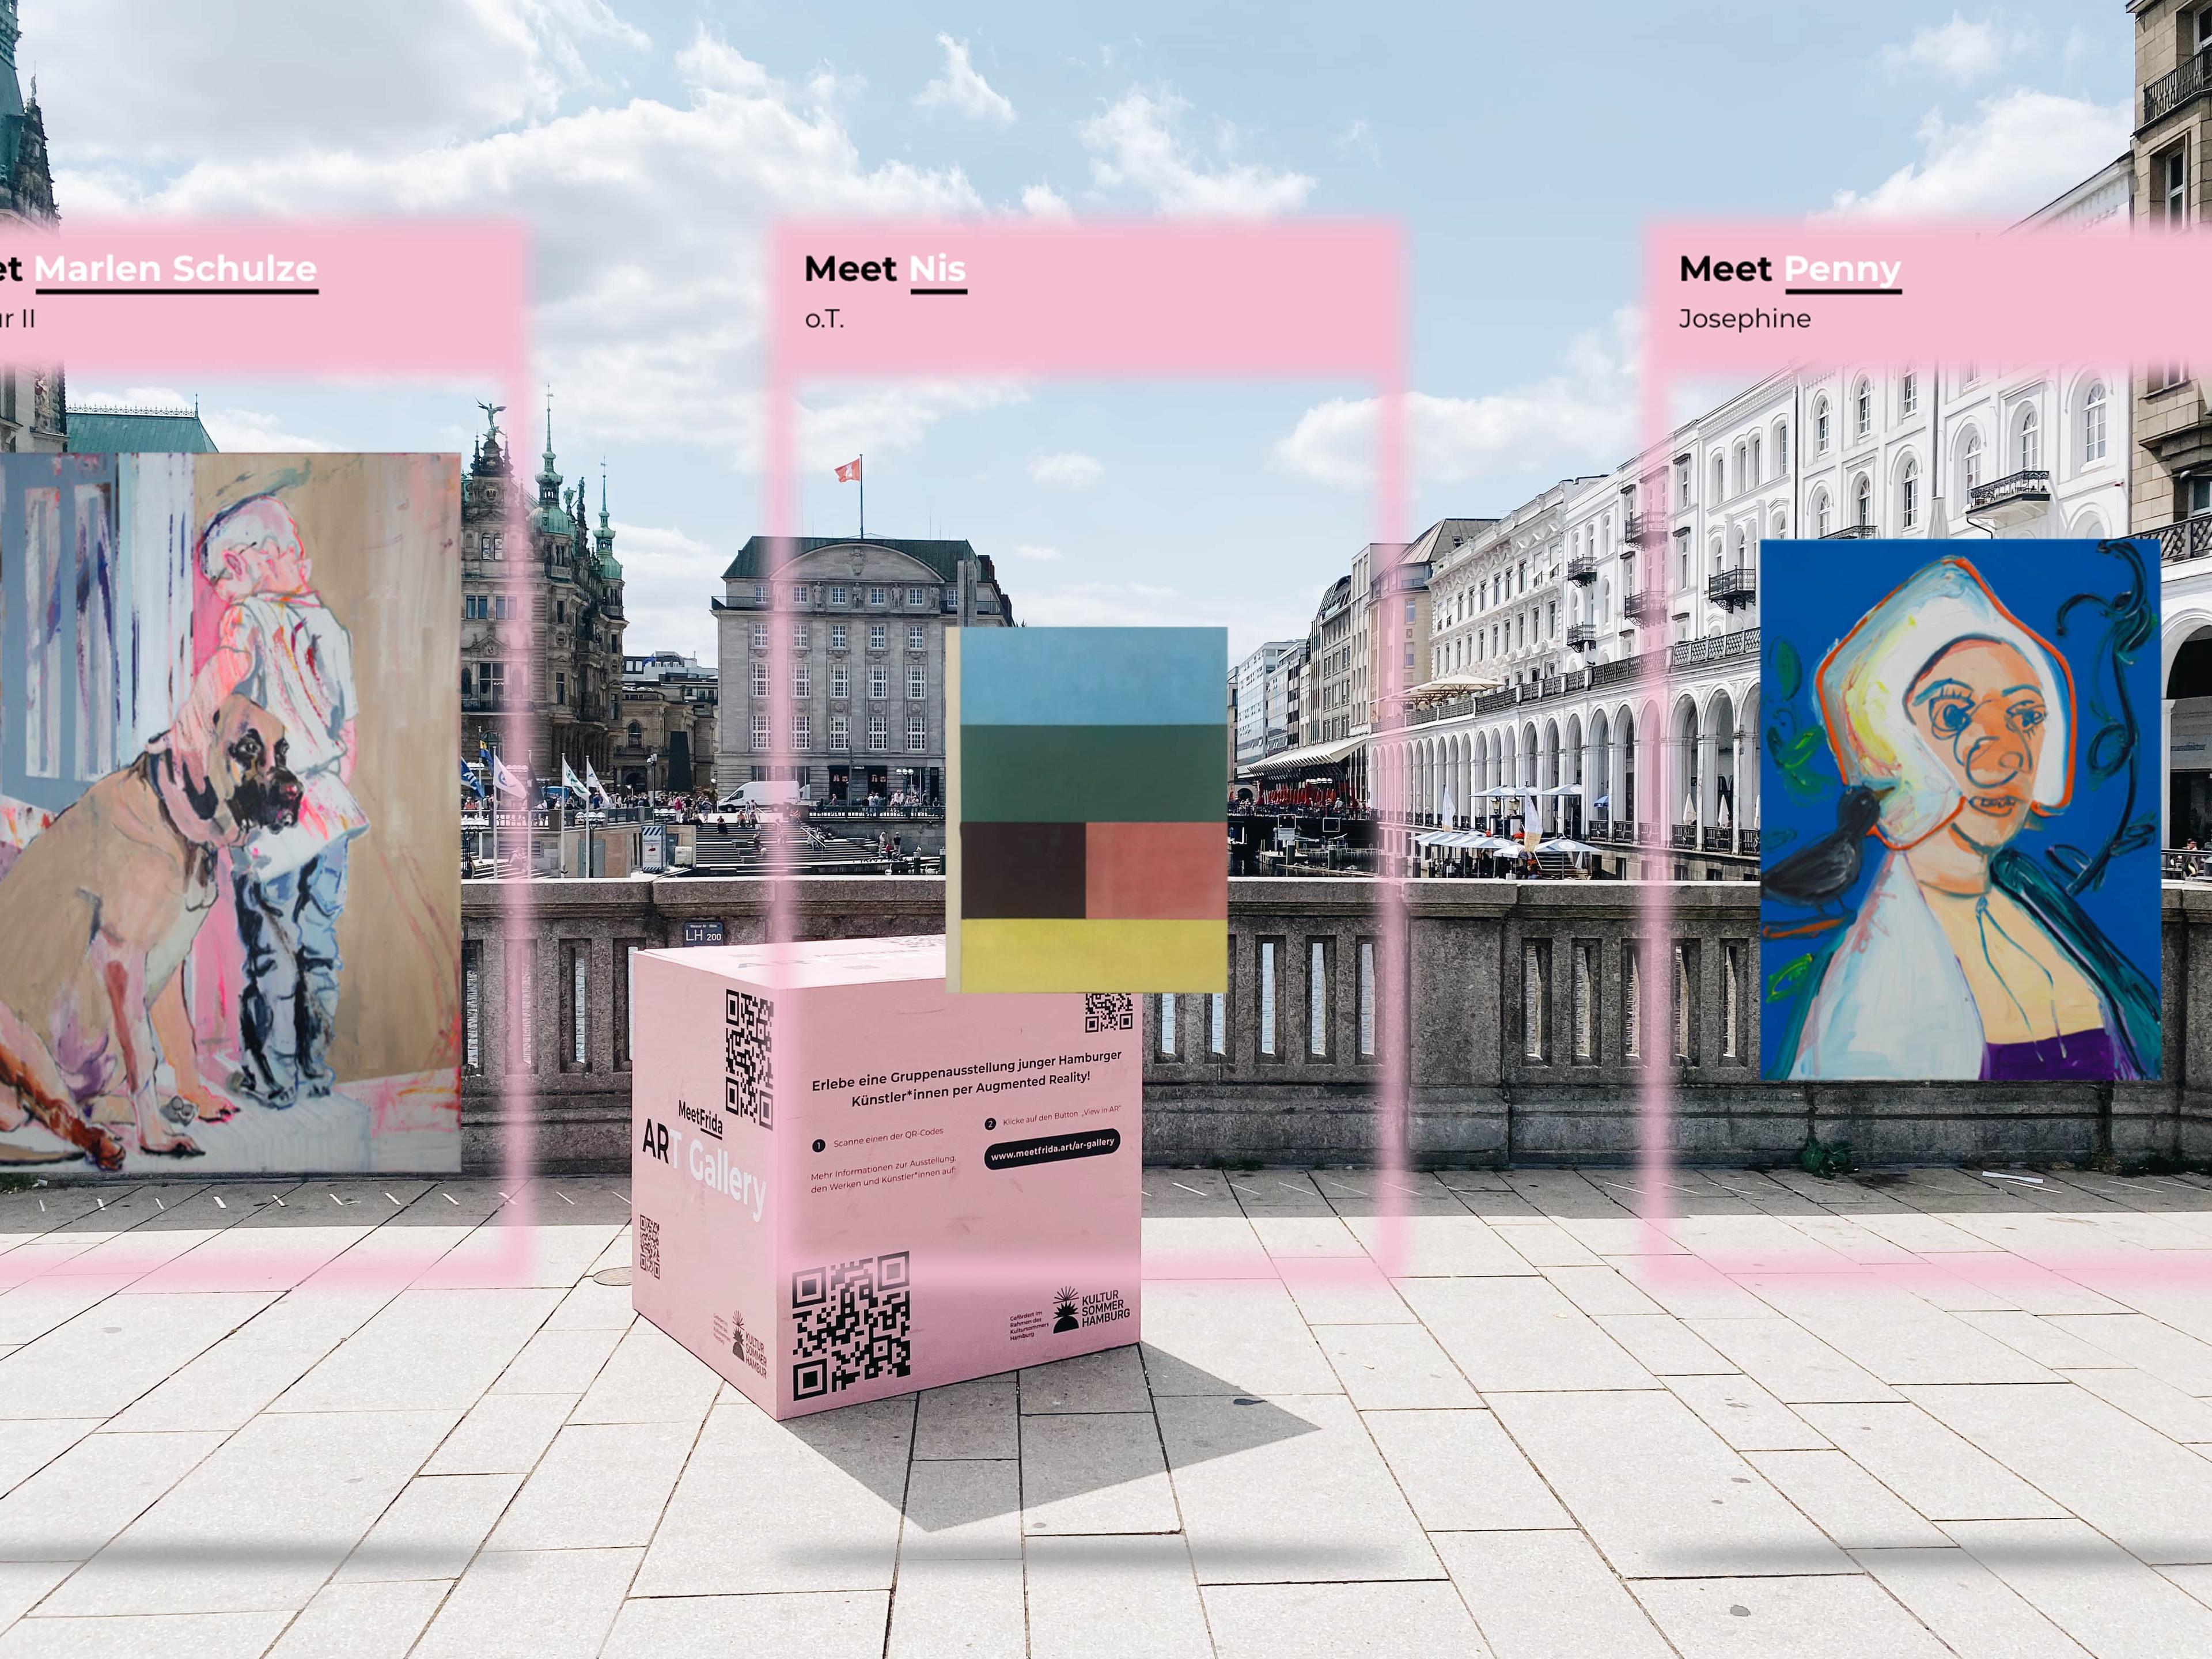 Bild ARt Gallery